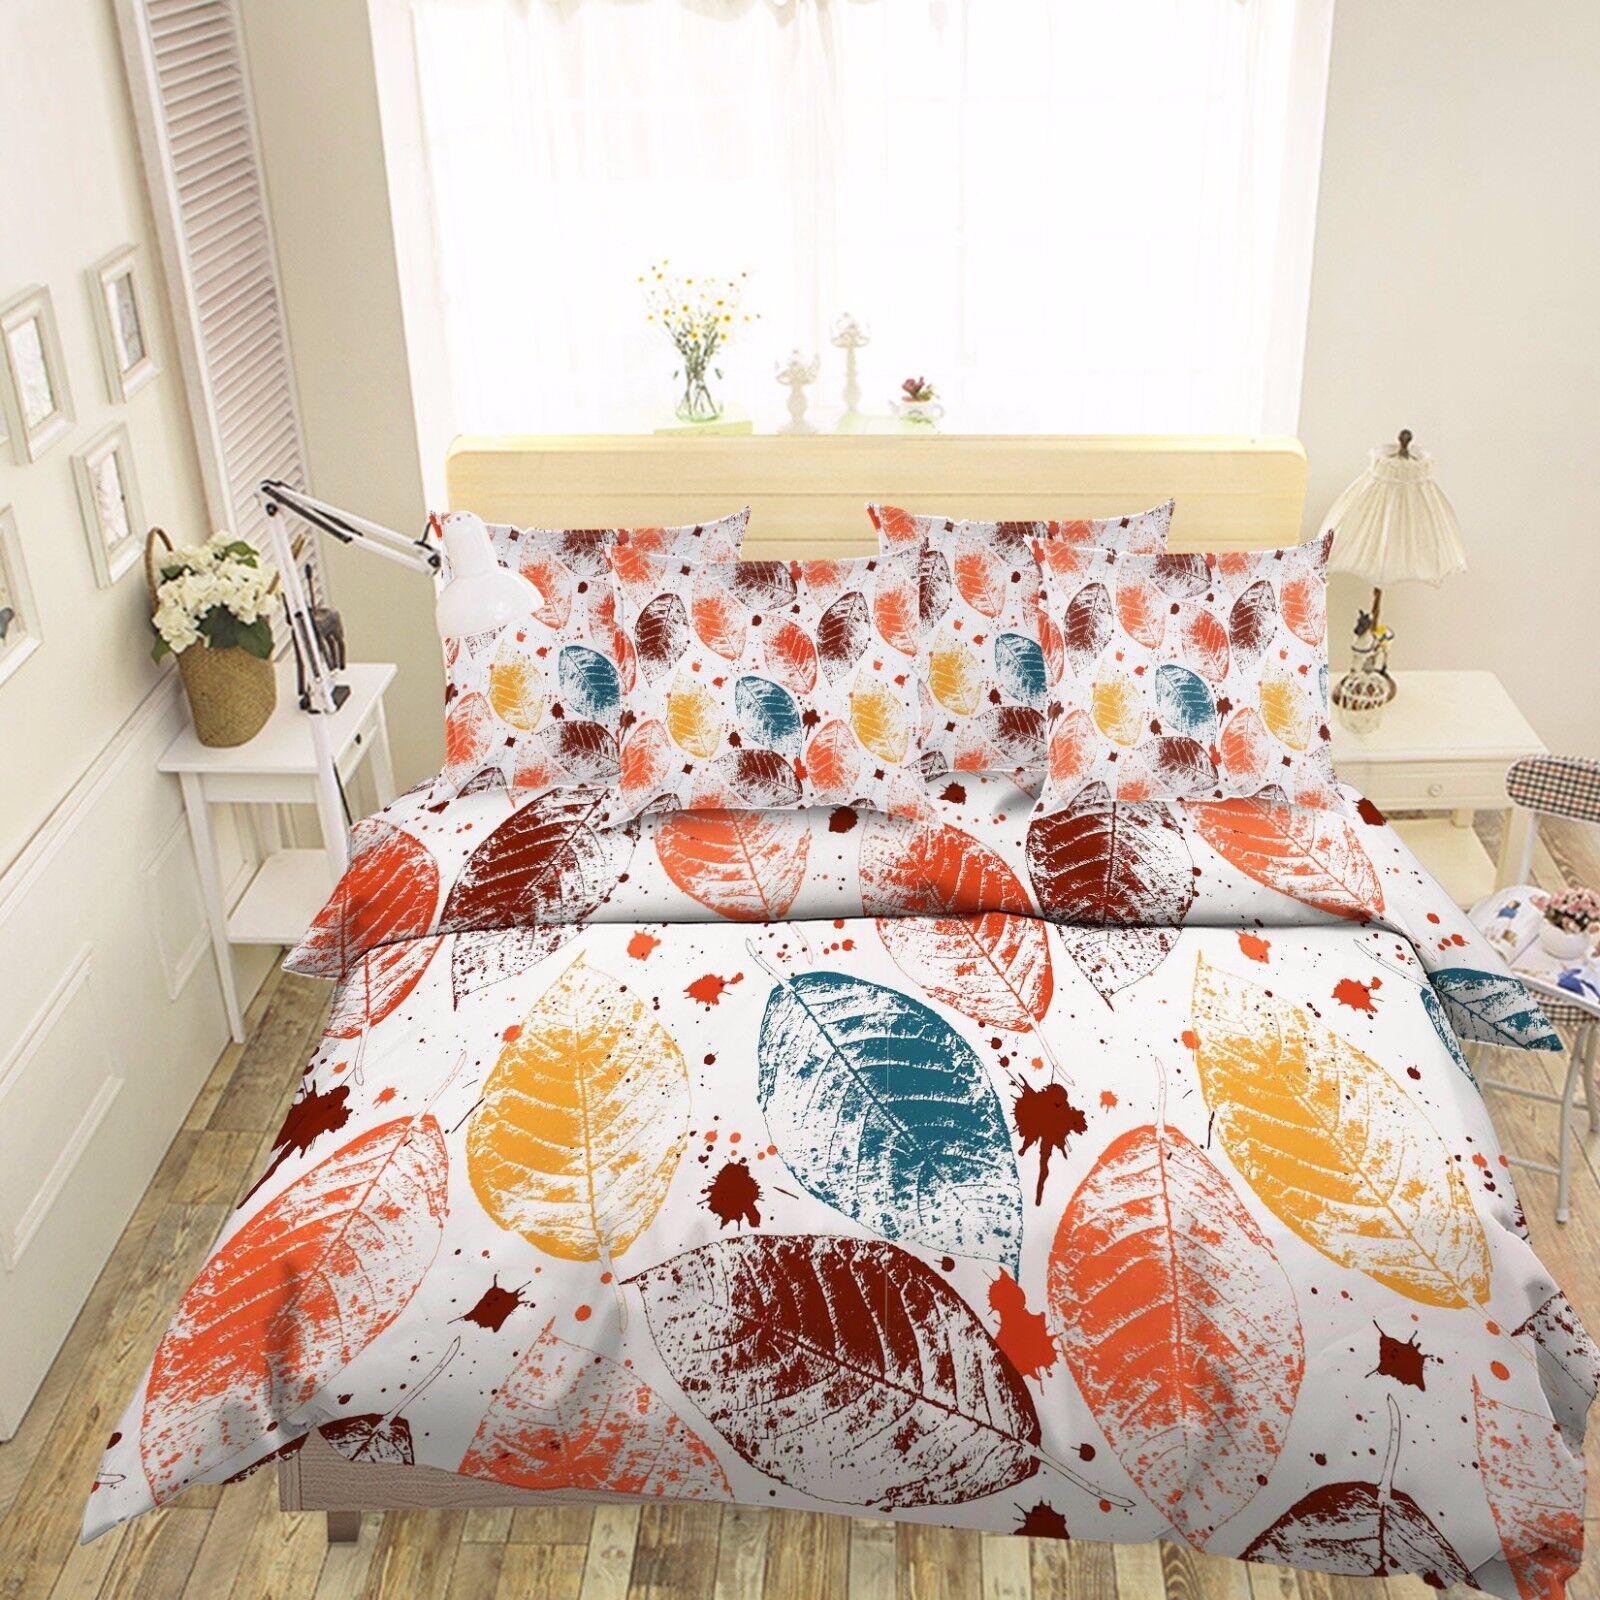 3D Paint Leaves 816 Bed Pillowcases Quilt Duvet Cover Set Single Queen UK Kyra